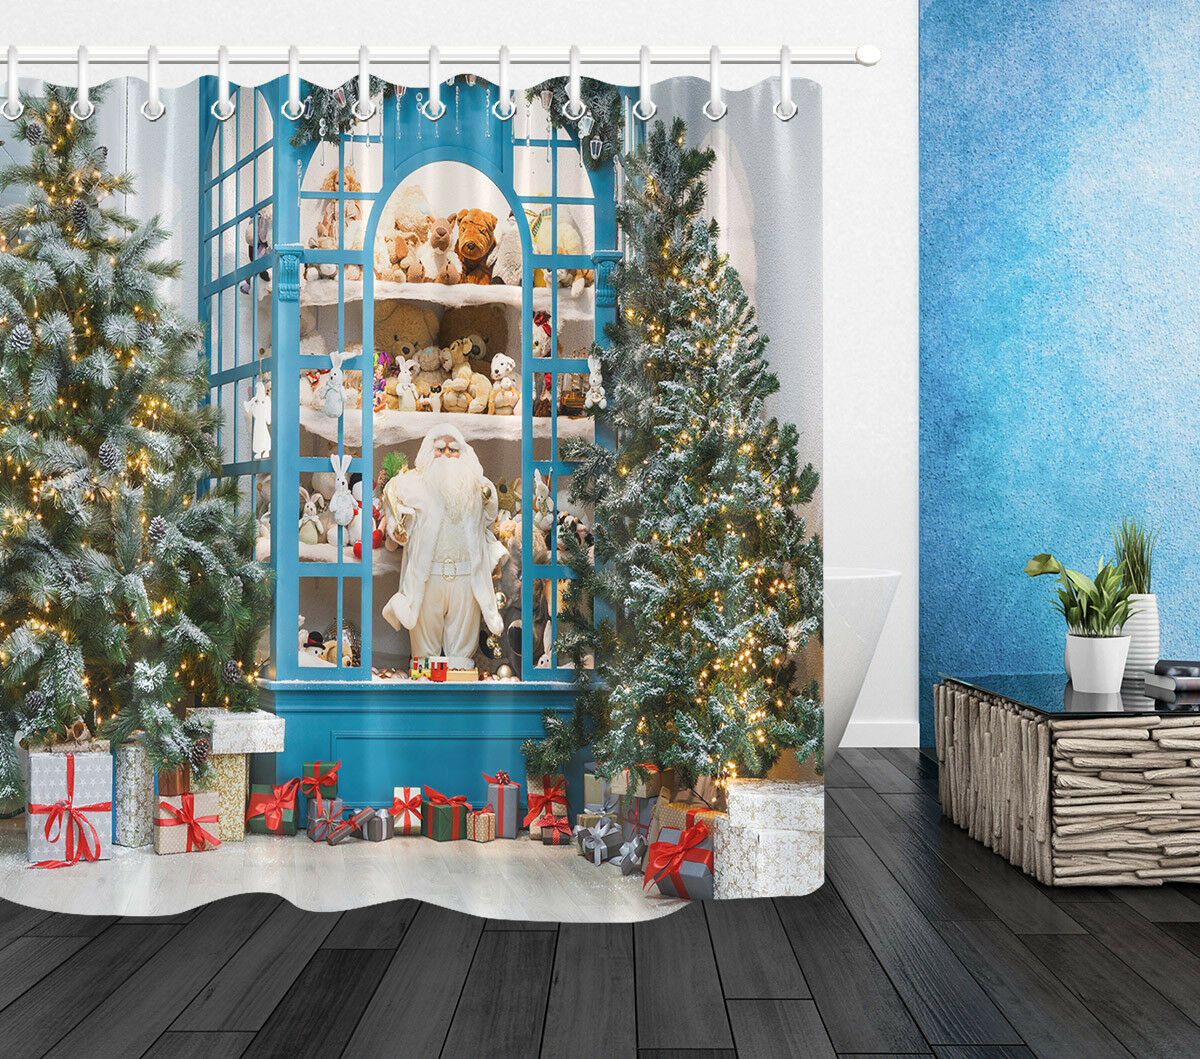 100% Polyester tissu arbre de noël jouet armoire rideau de douche ensemble salle de bain crochets